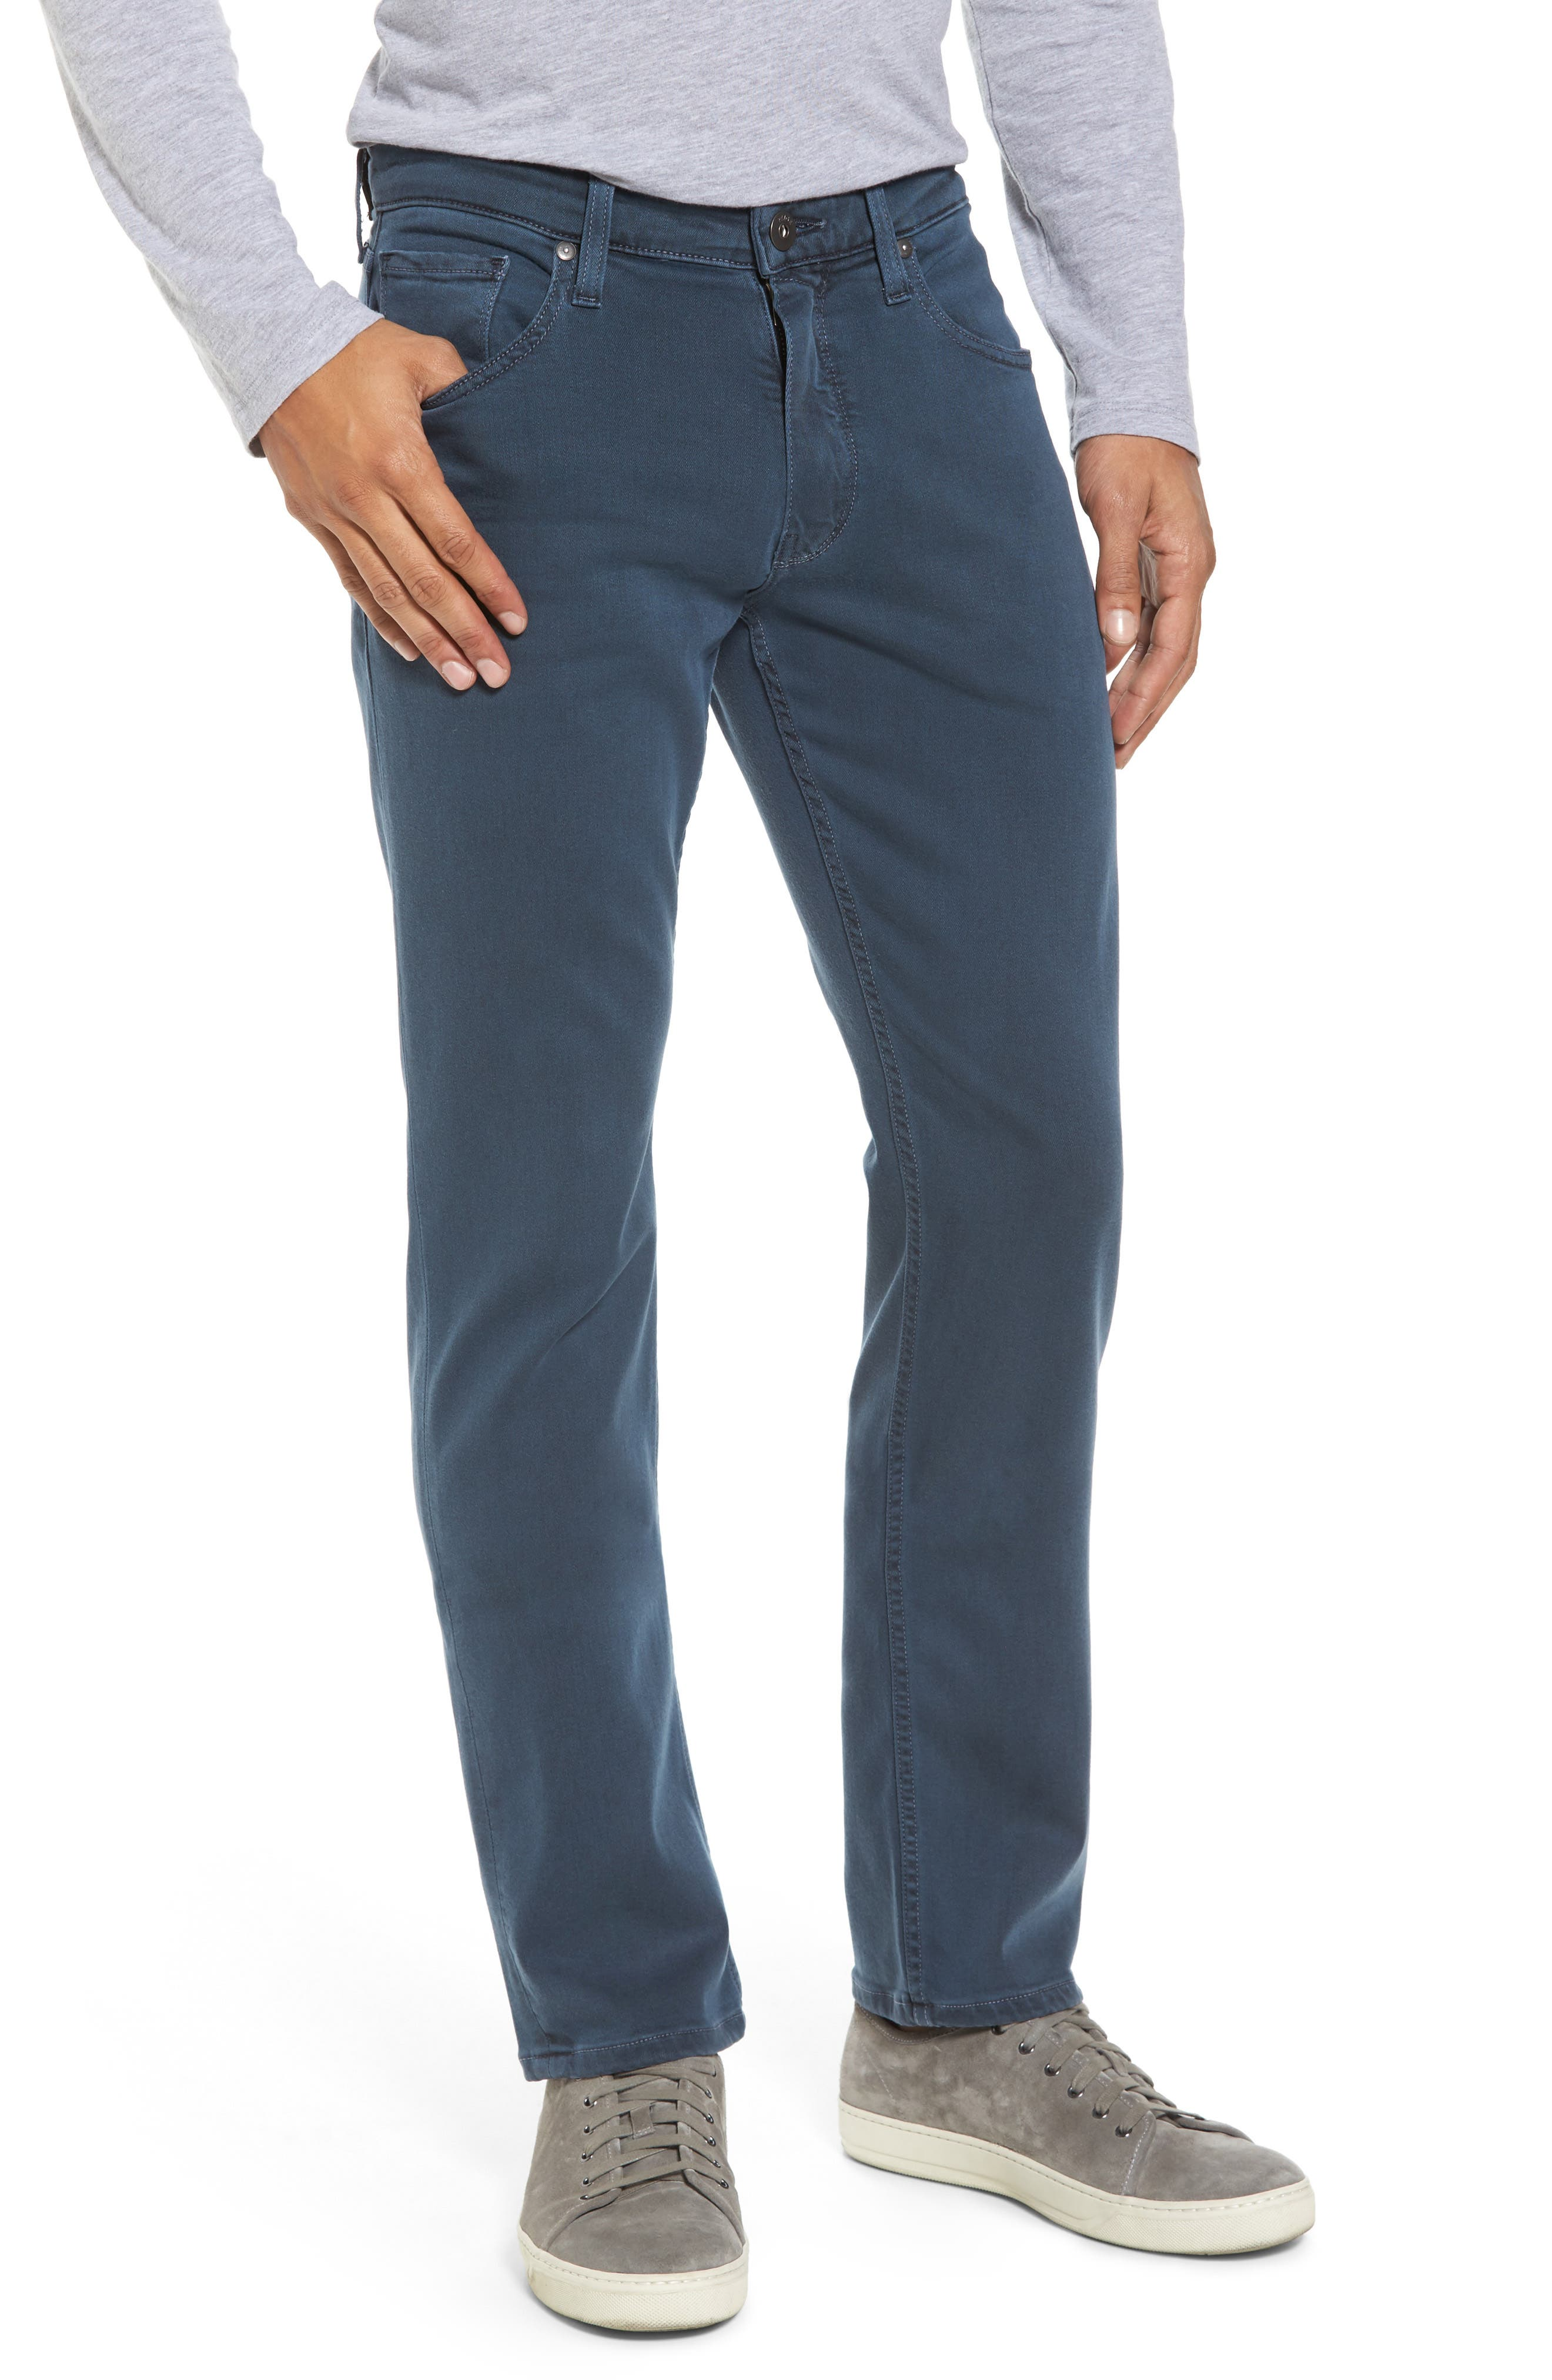 Transcend - Federal Slim Straight Fit Jeans,                             Main thumbnail 1, color,                             VINTAGE AMALFI